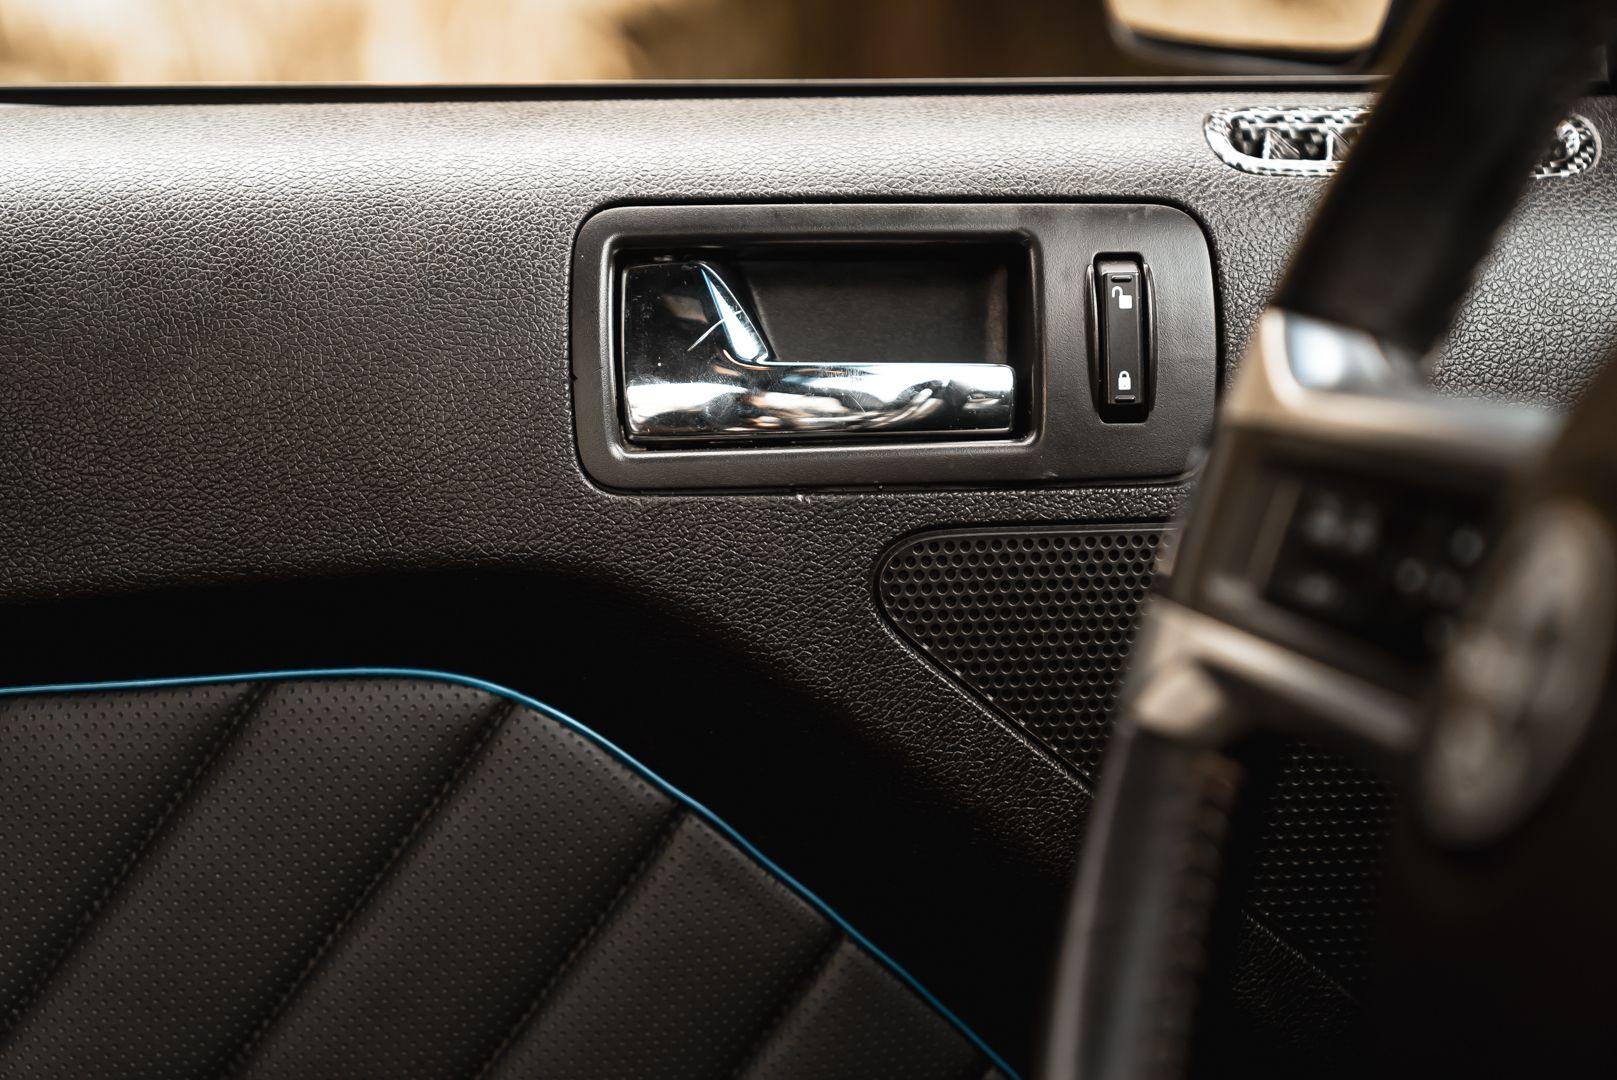 2012 Ford Mustang 5.0 V8 82088